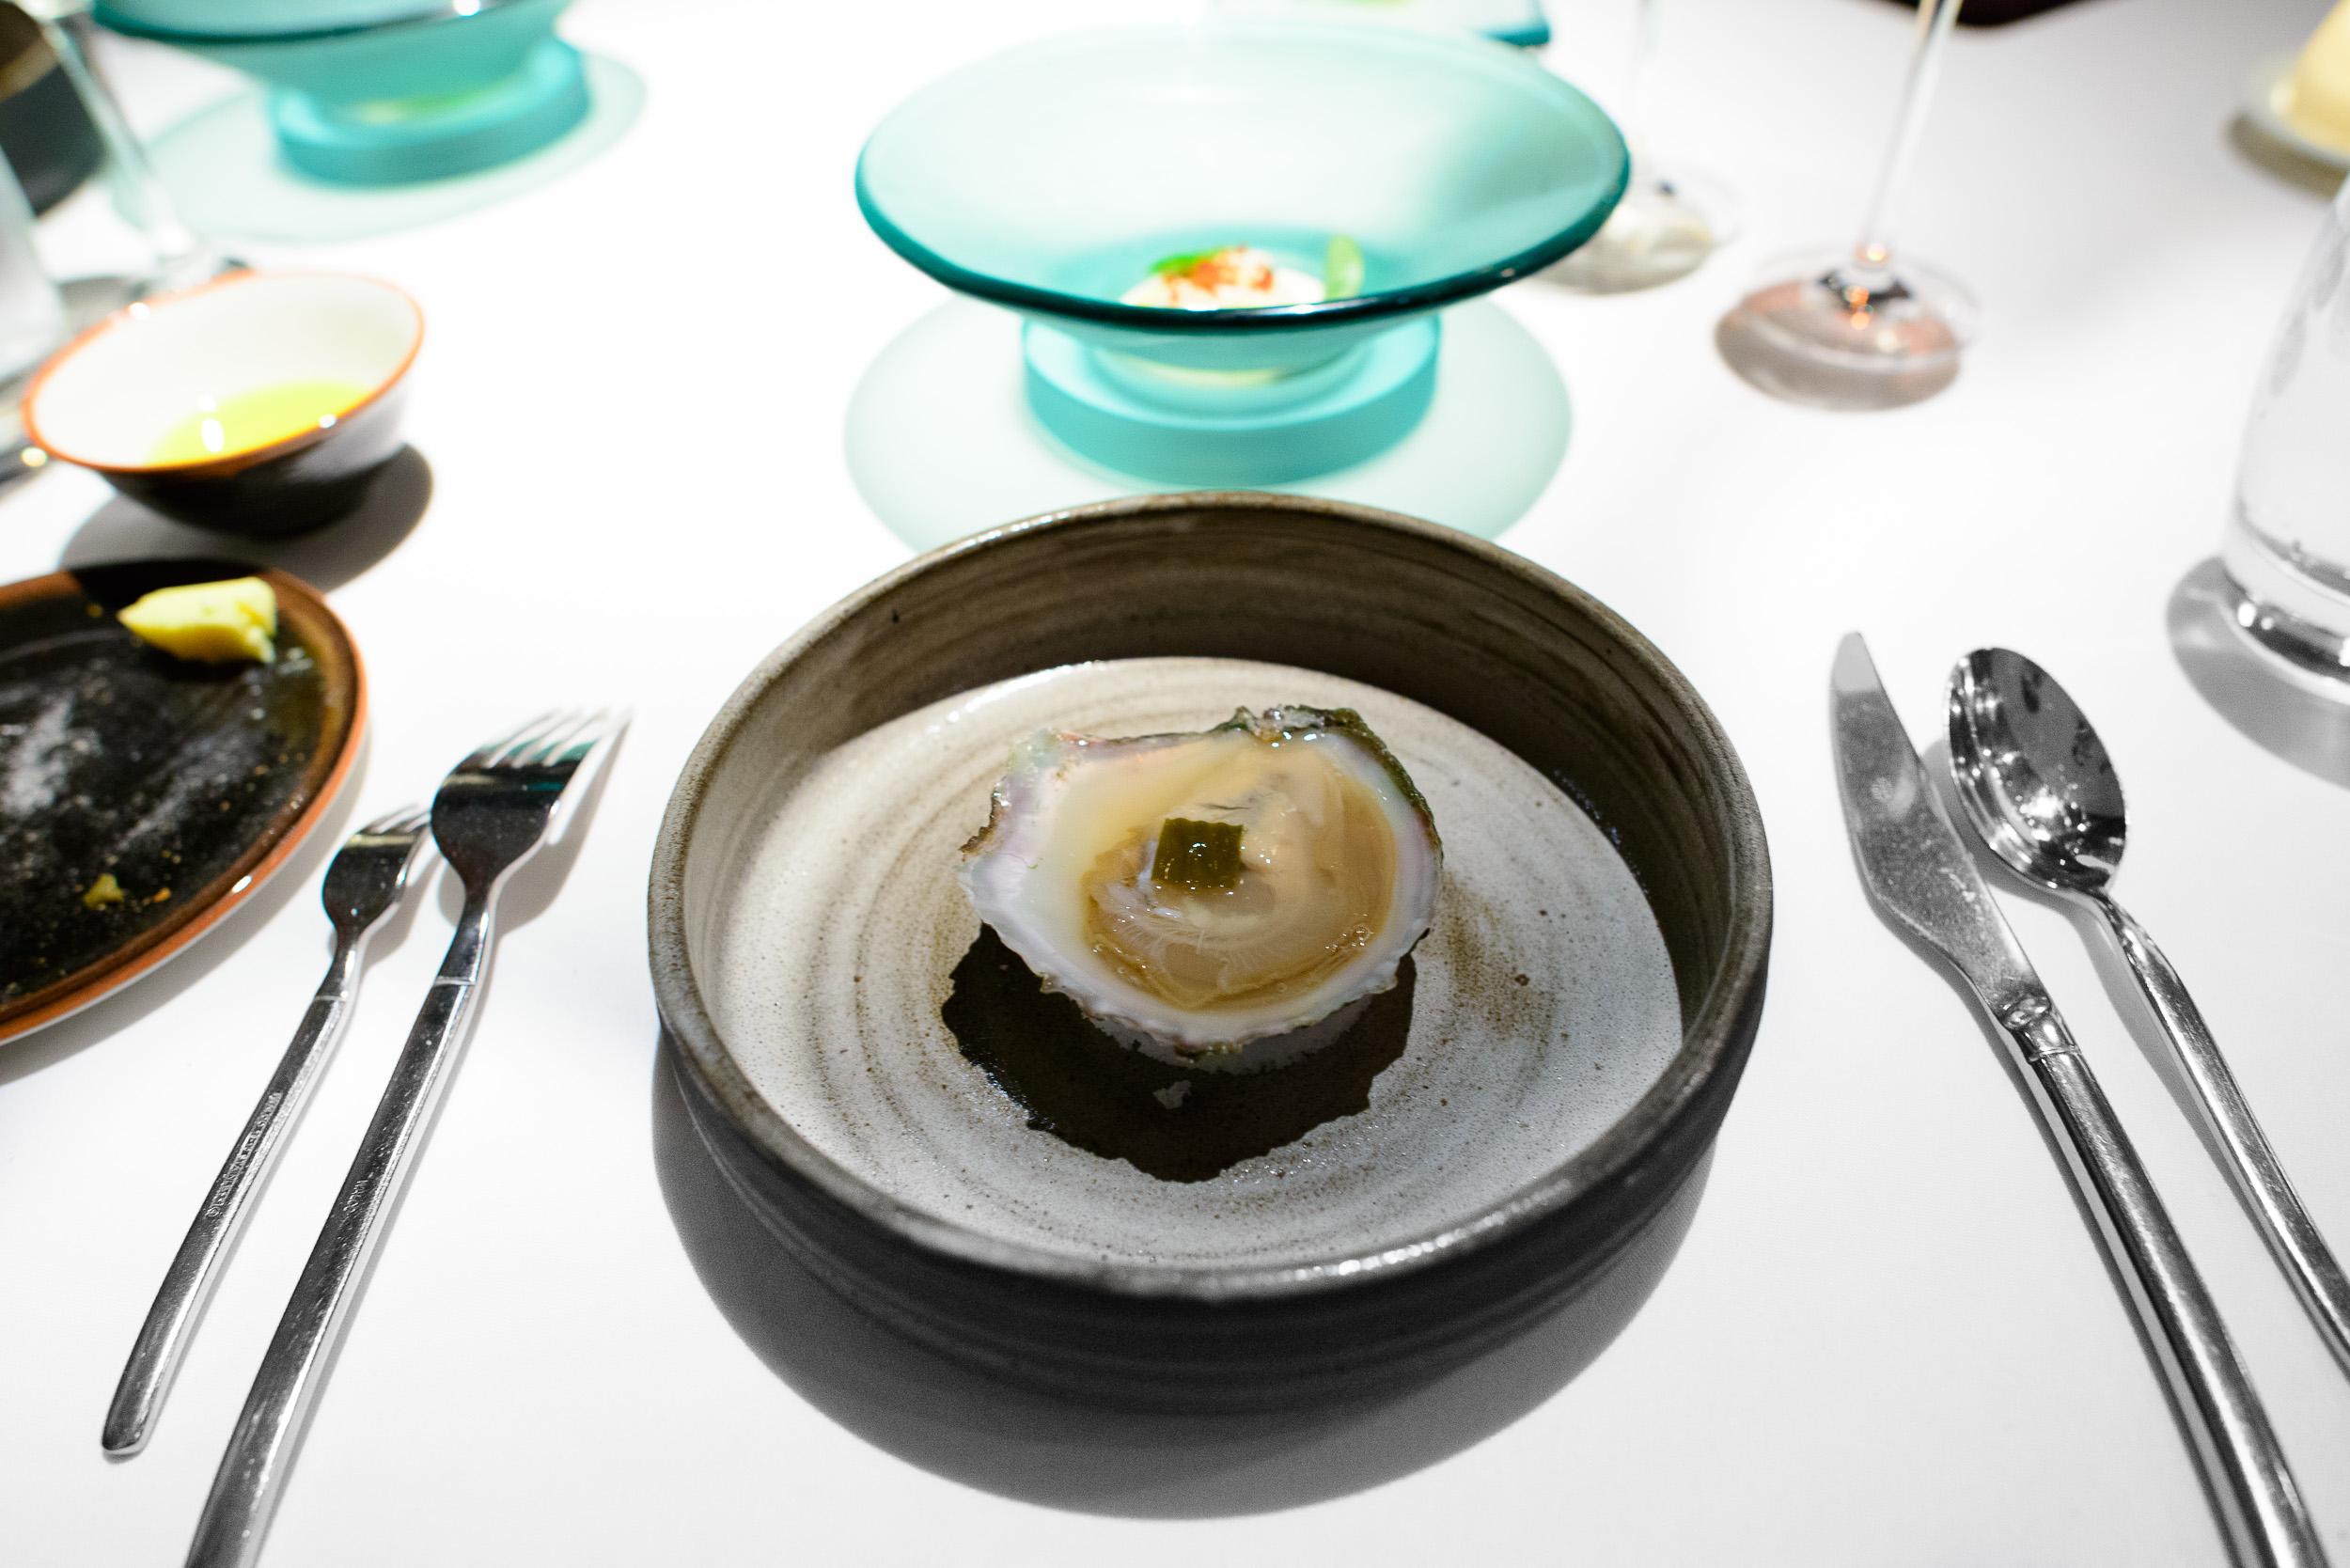 11th Course: Oyster, distilled sake, marinated algae